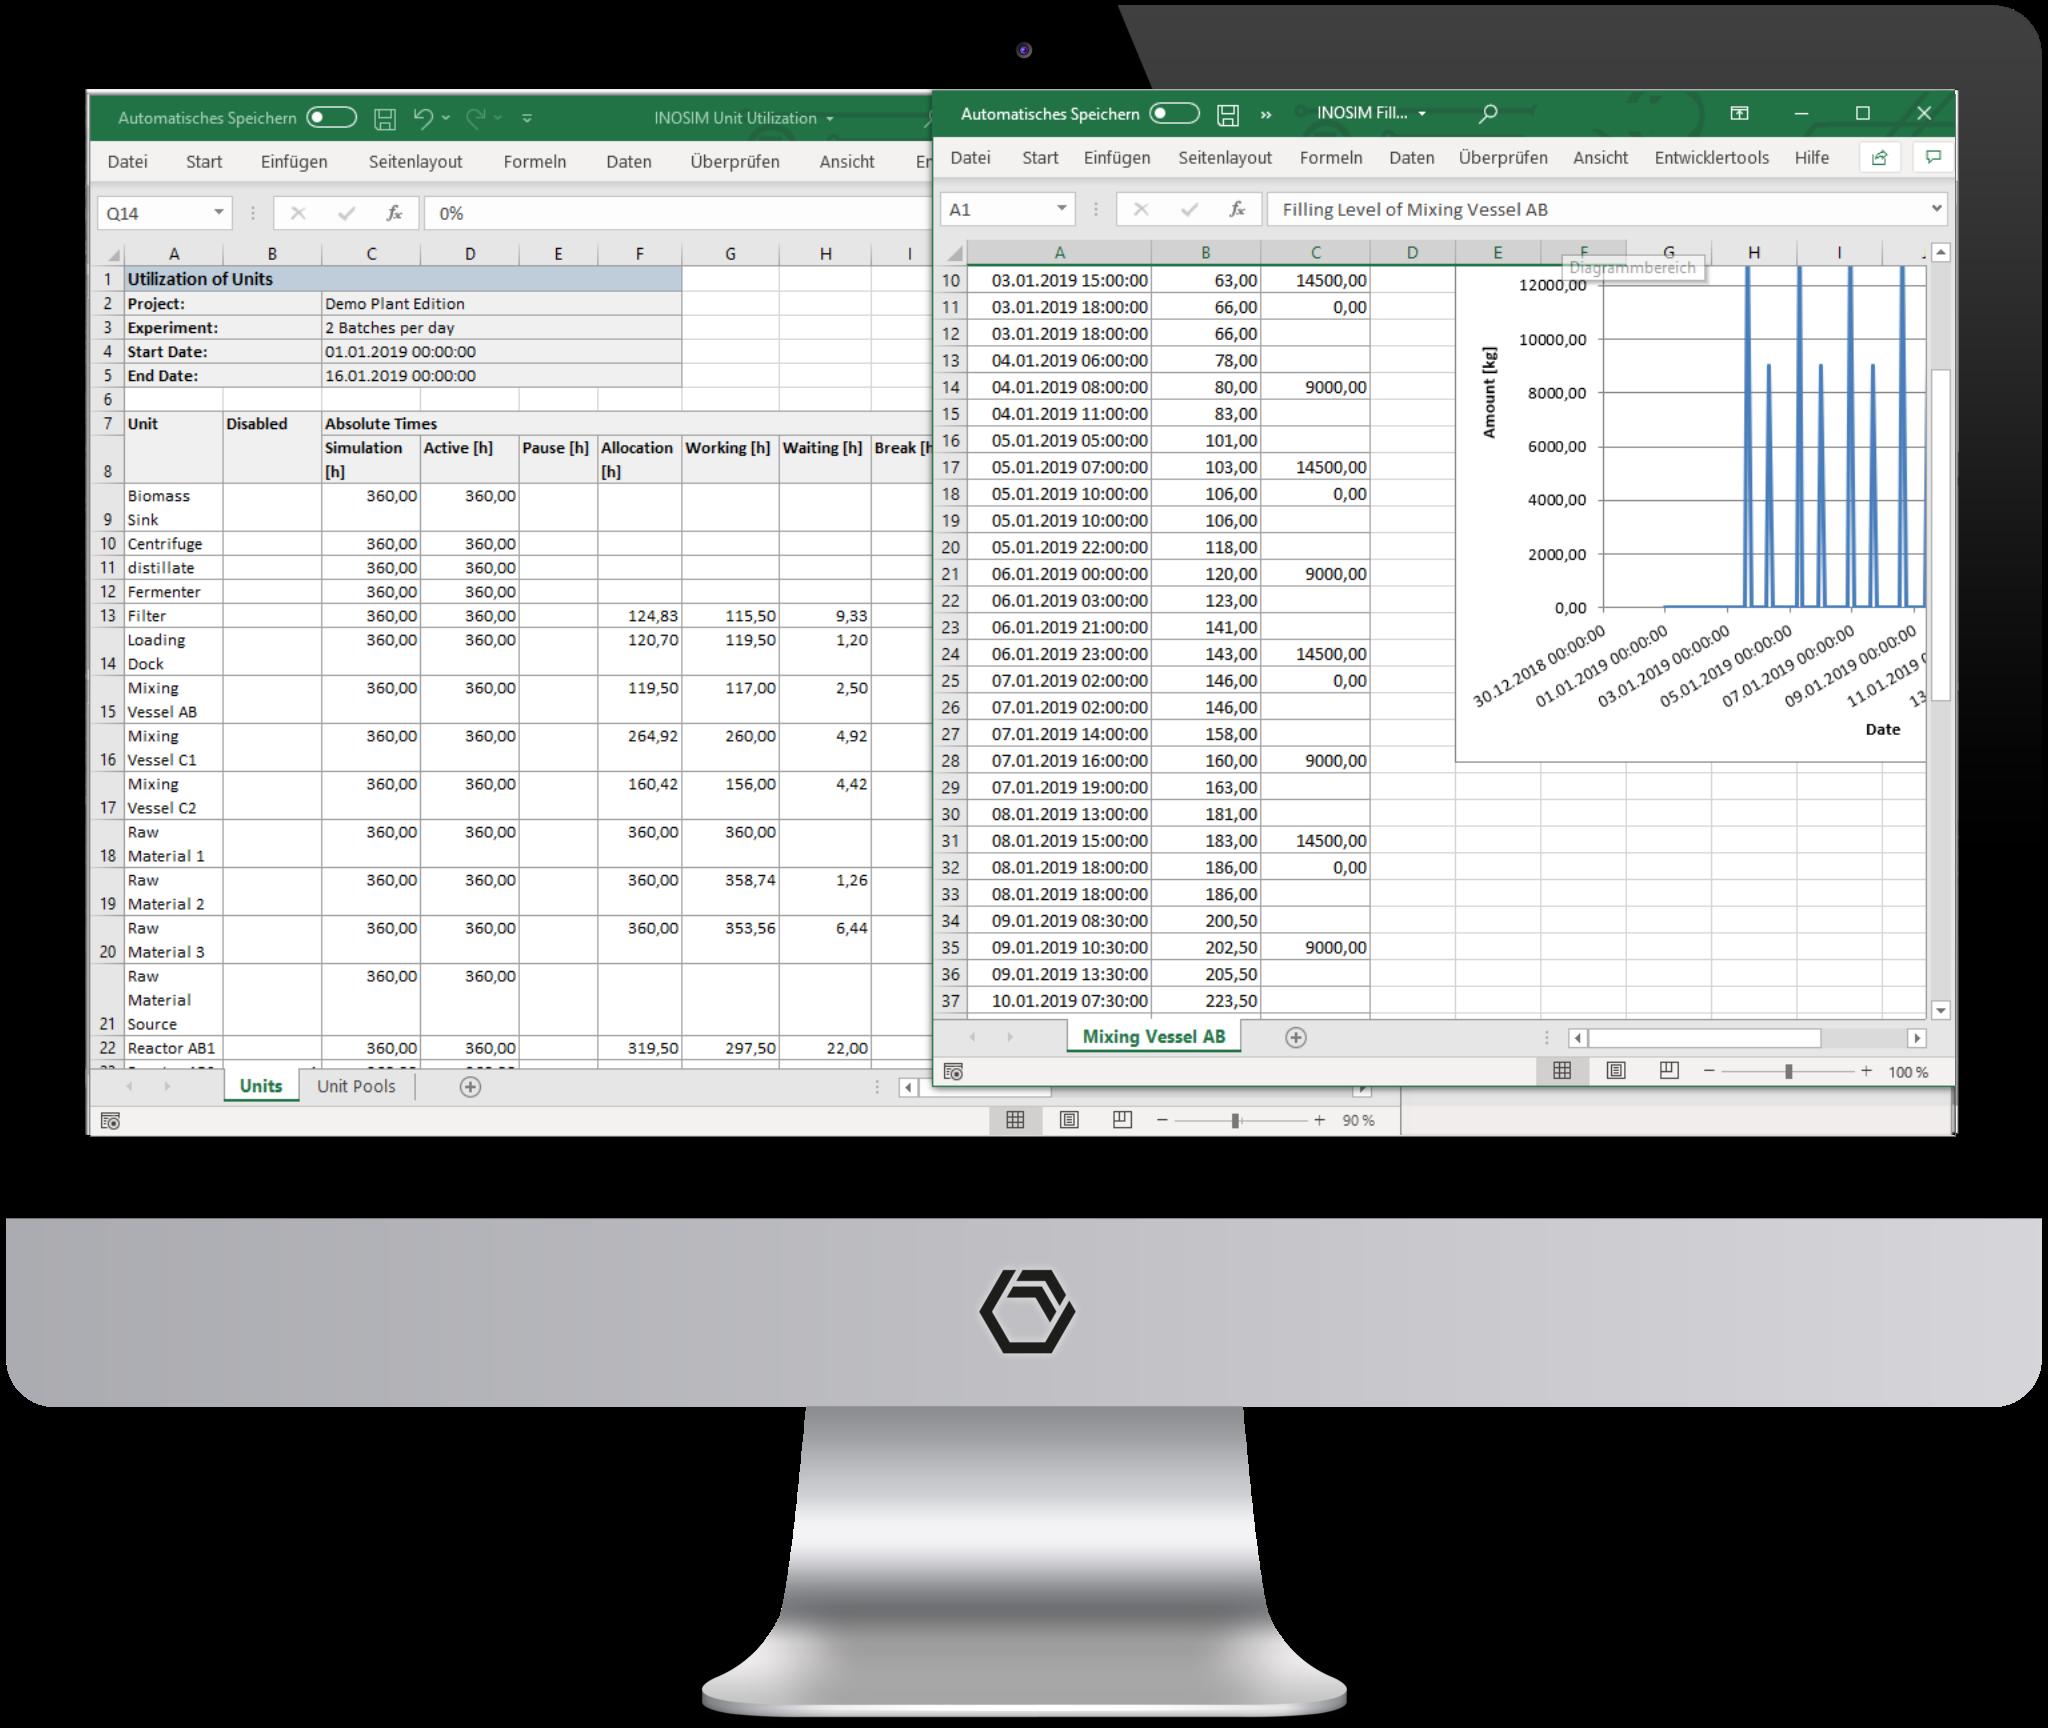 INOSIM creates result workbooks automatically